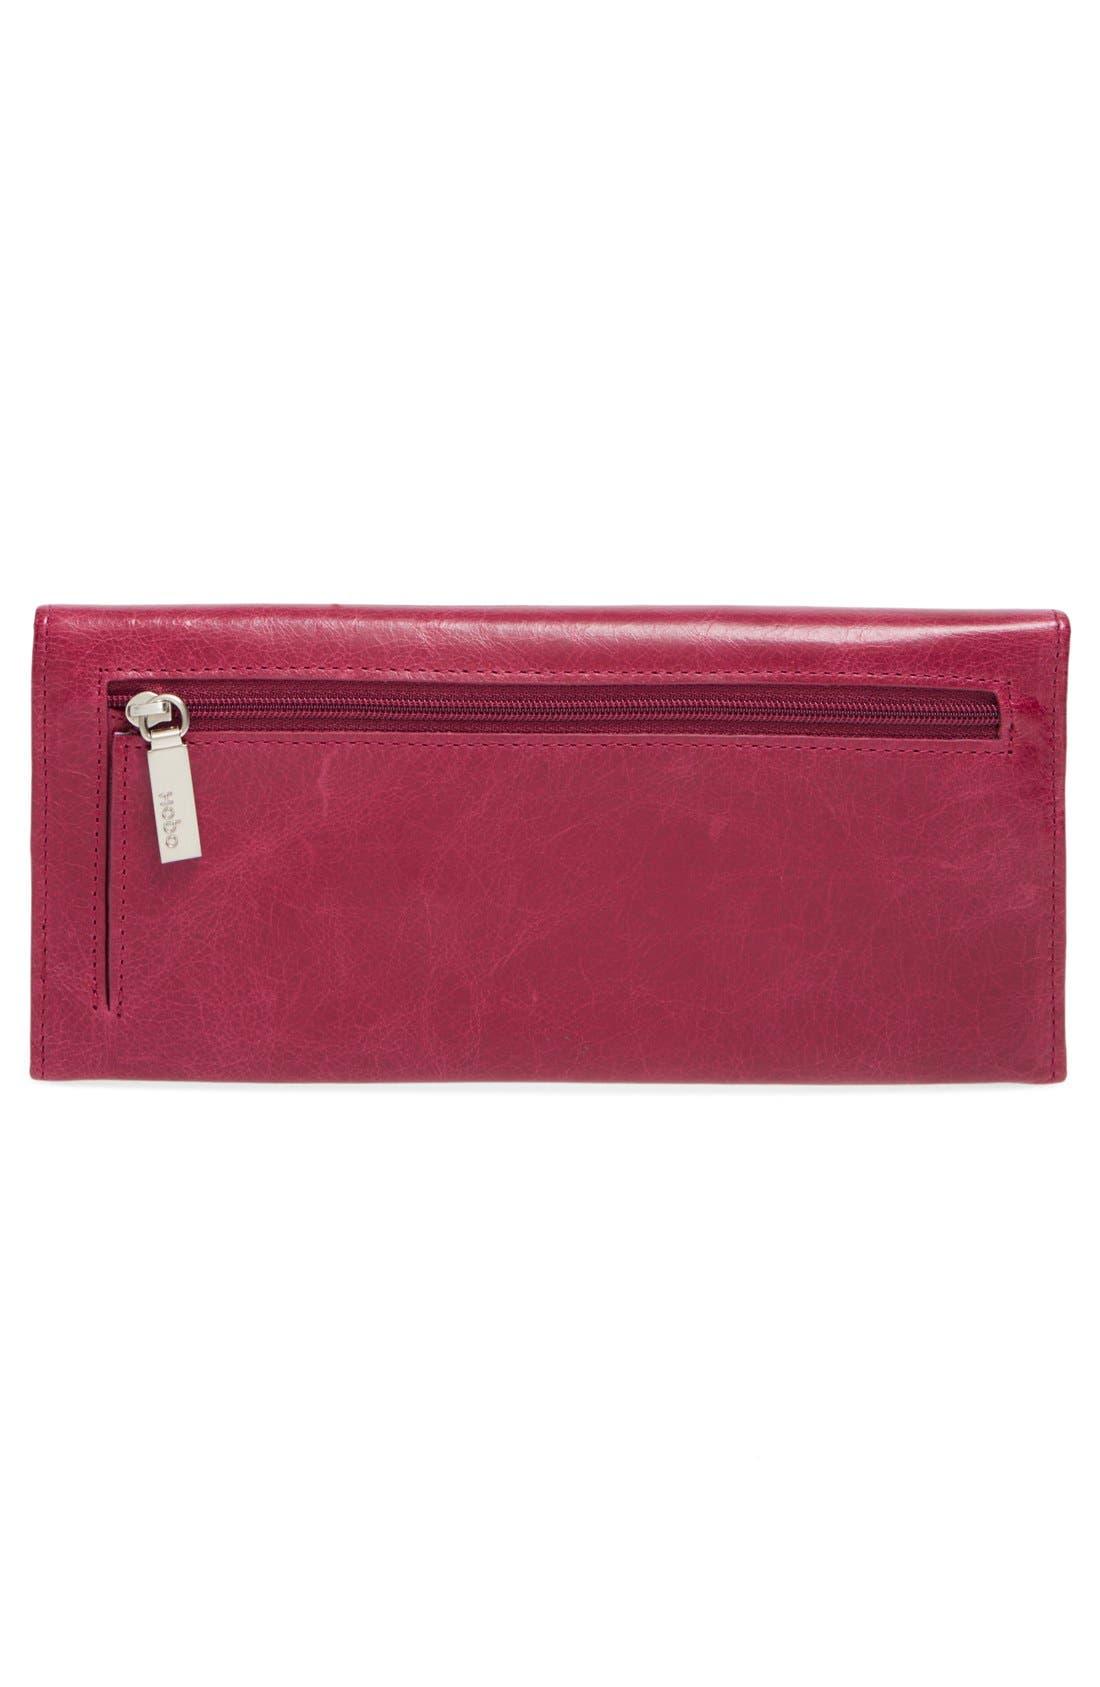 'Sadie' Leather Wallet,                             Alternate thumbnail 181, color,